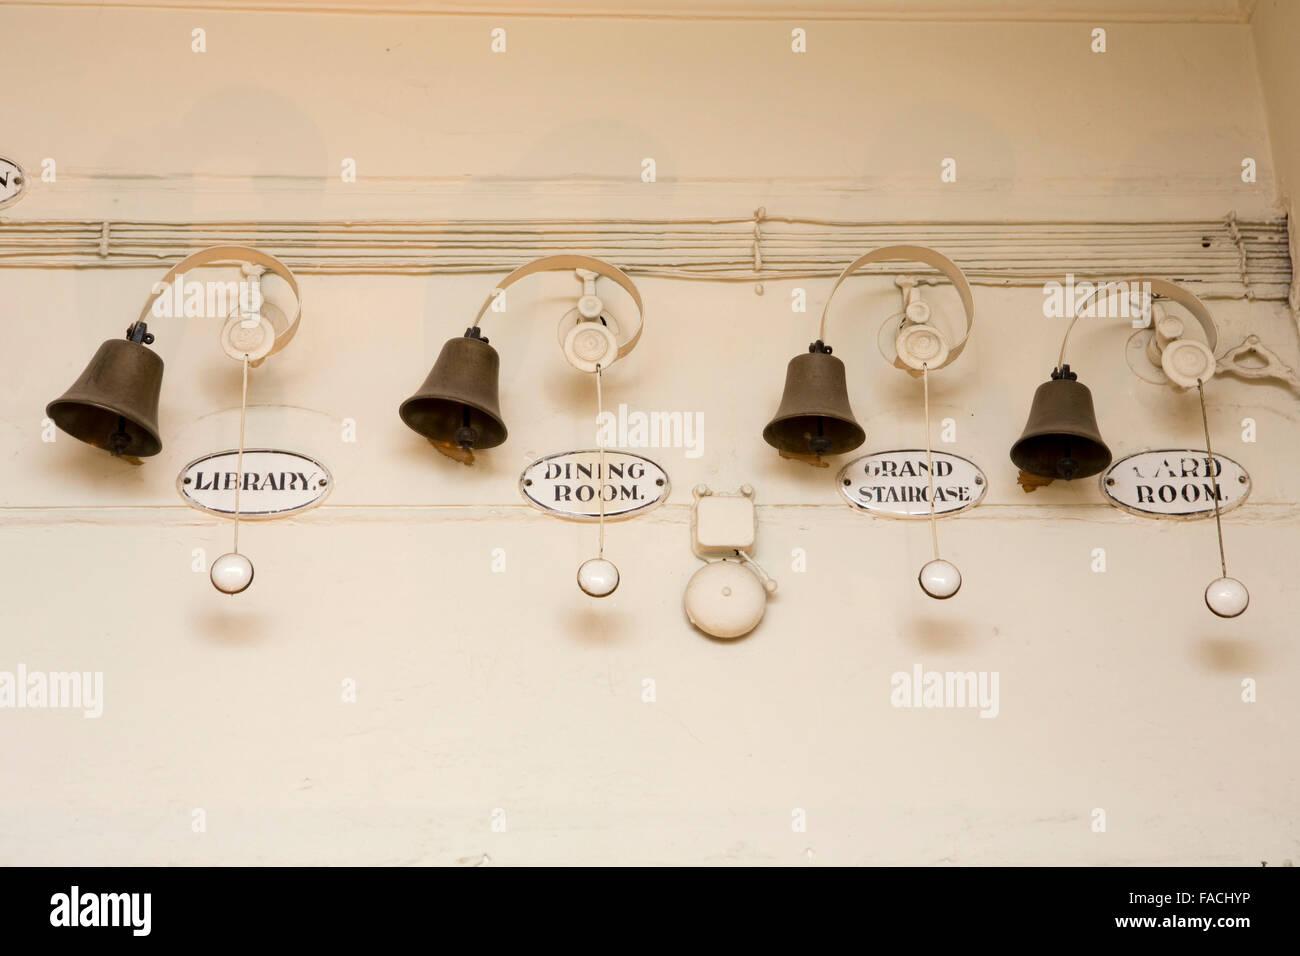 UK, England, Cheshire, Knutsford, Tatton Hall, Servant's Bells - Stock Image